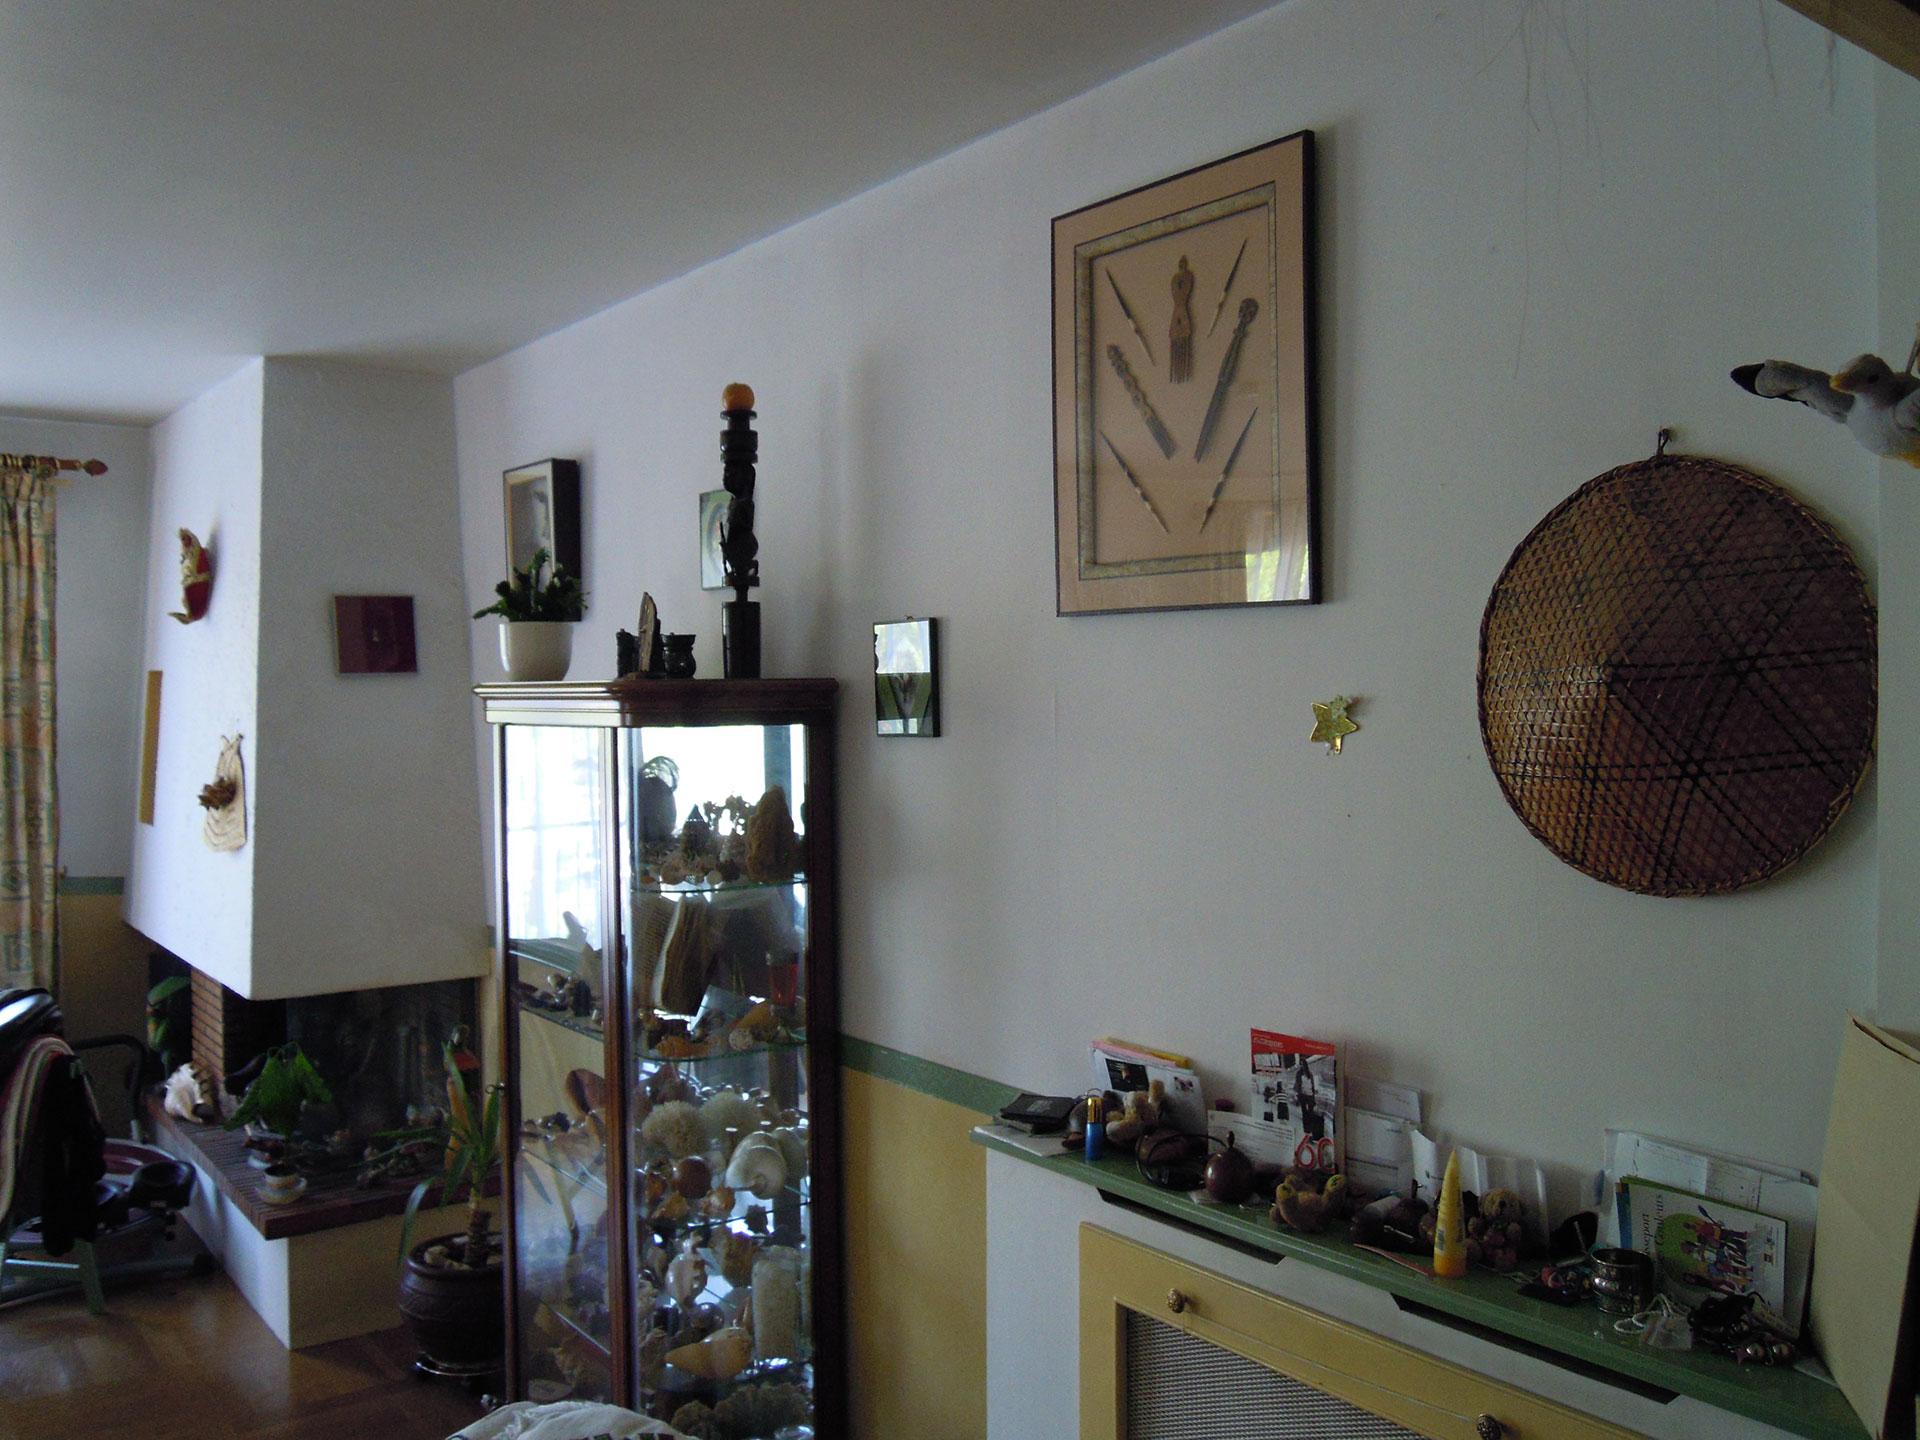 st-maur-interieur-2